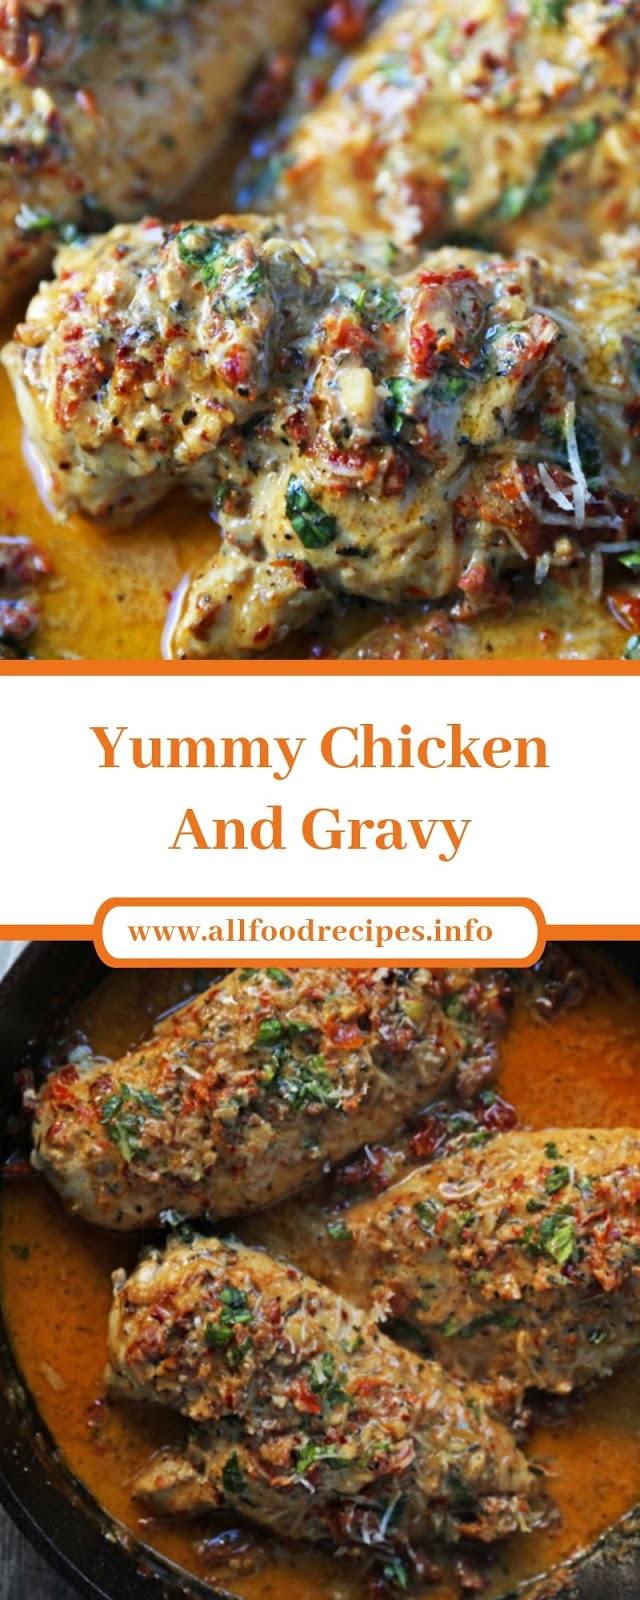 Yummy Chicken And Gravy